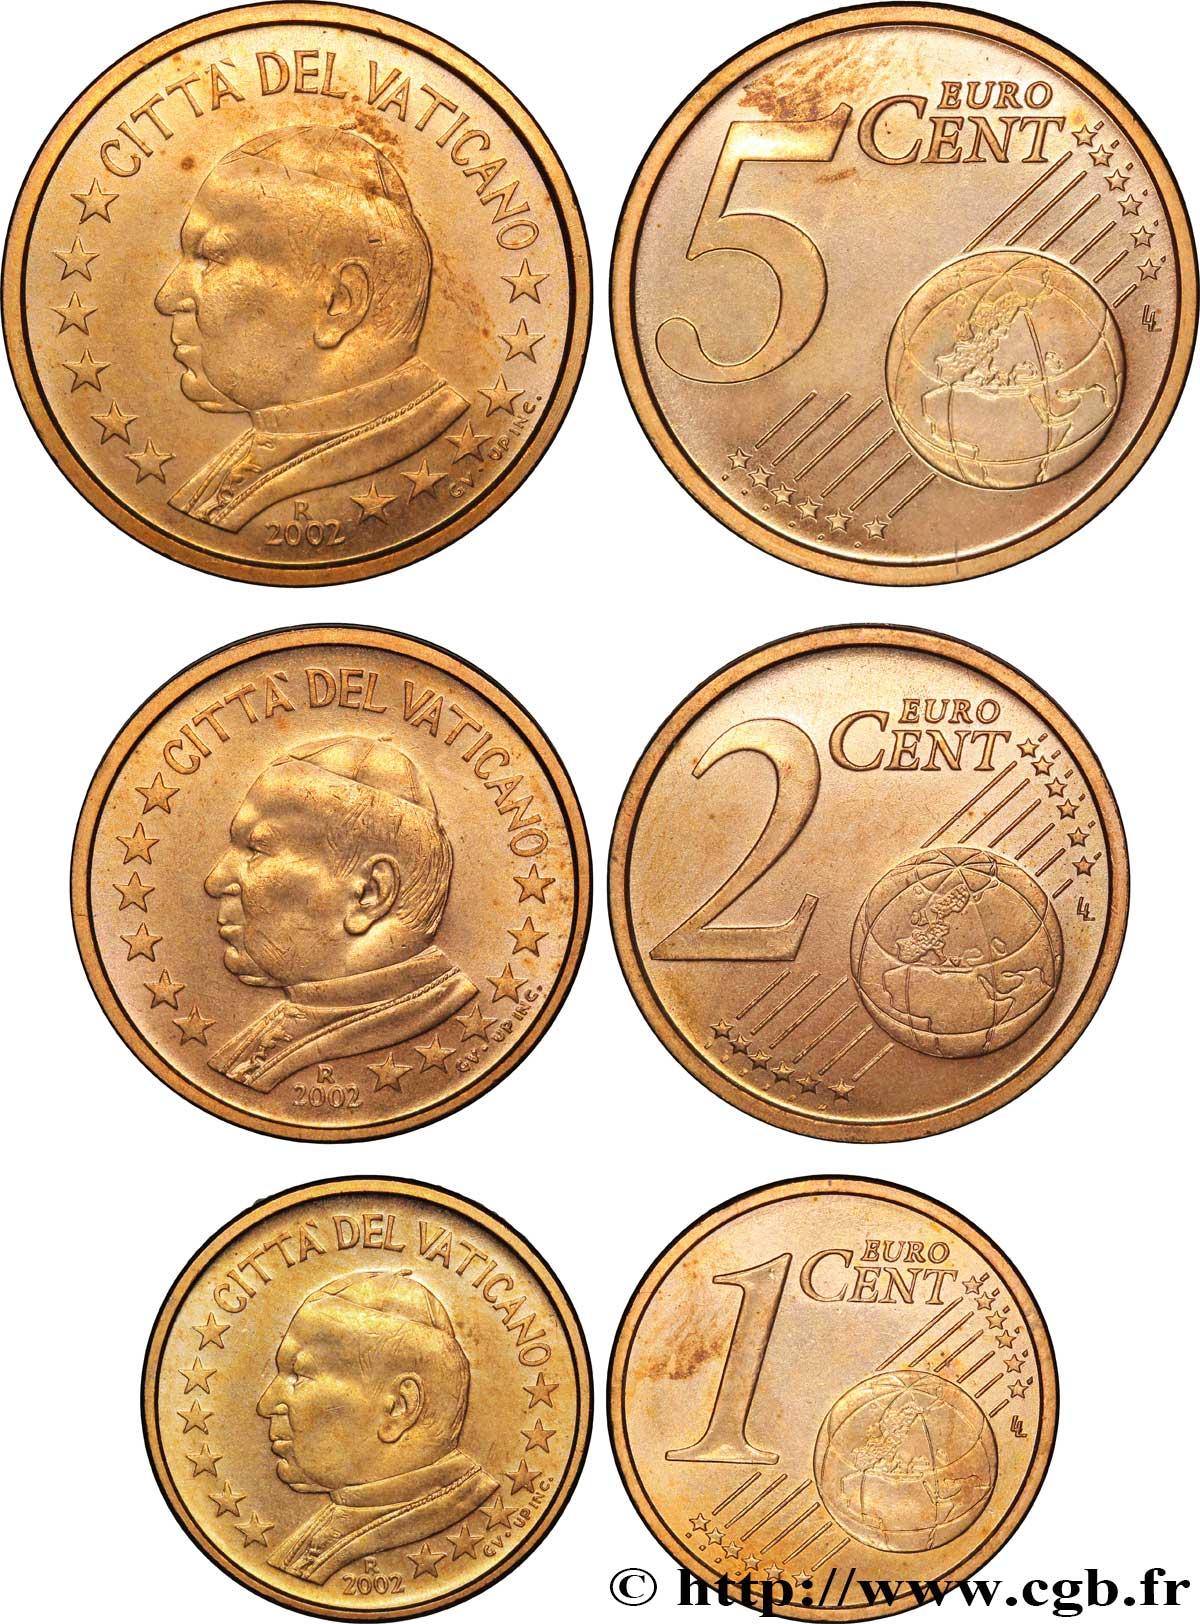 Vatikan Lot 1 Cent 2 Cent 5 Cent Jean Paul Ii 2002 Rome